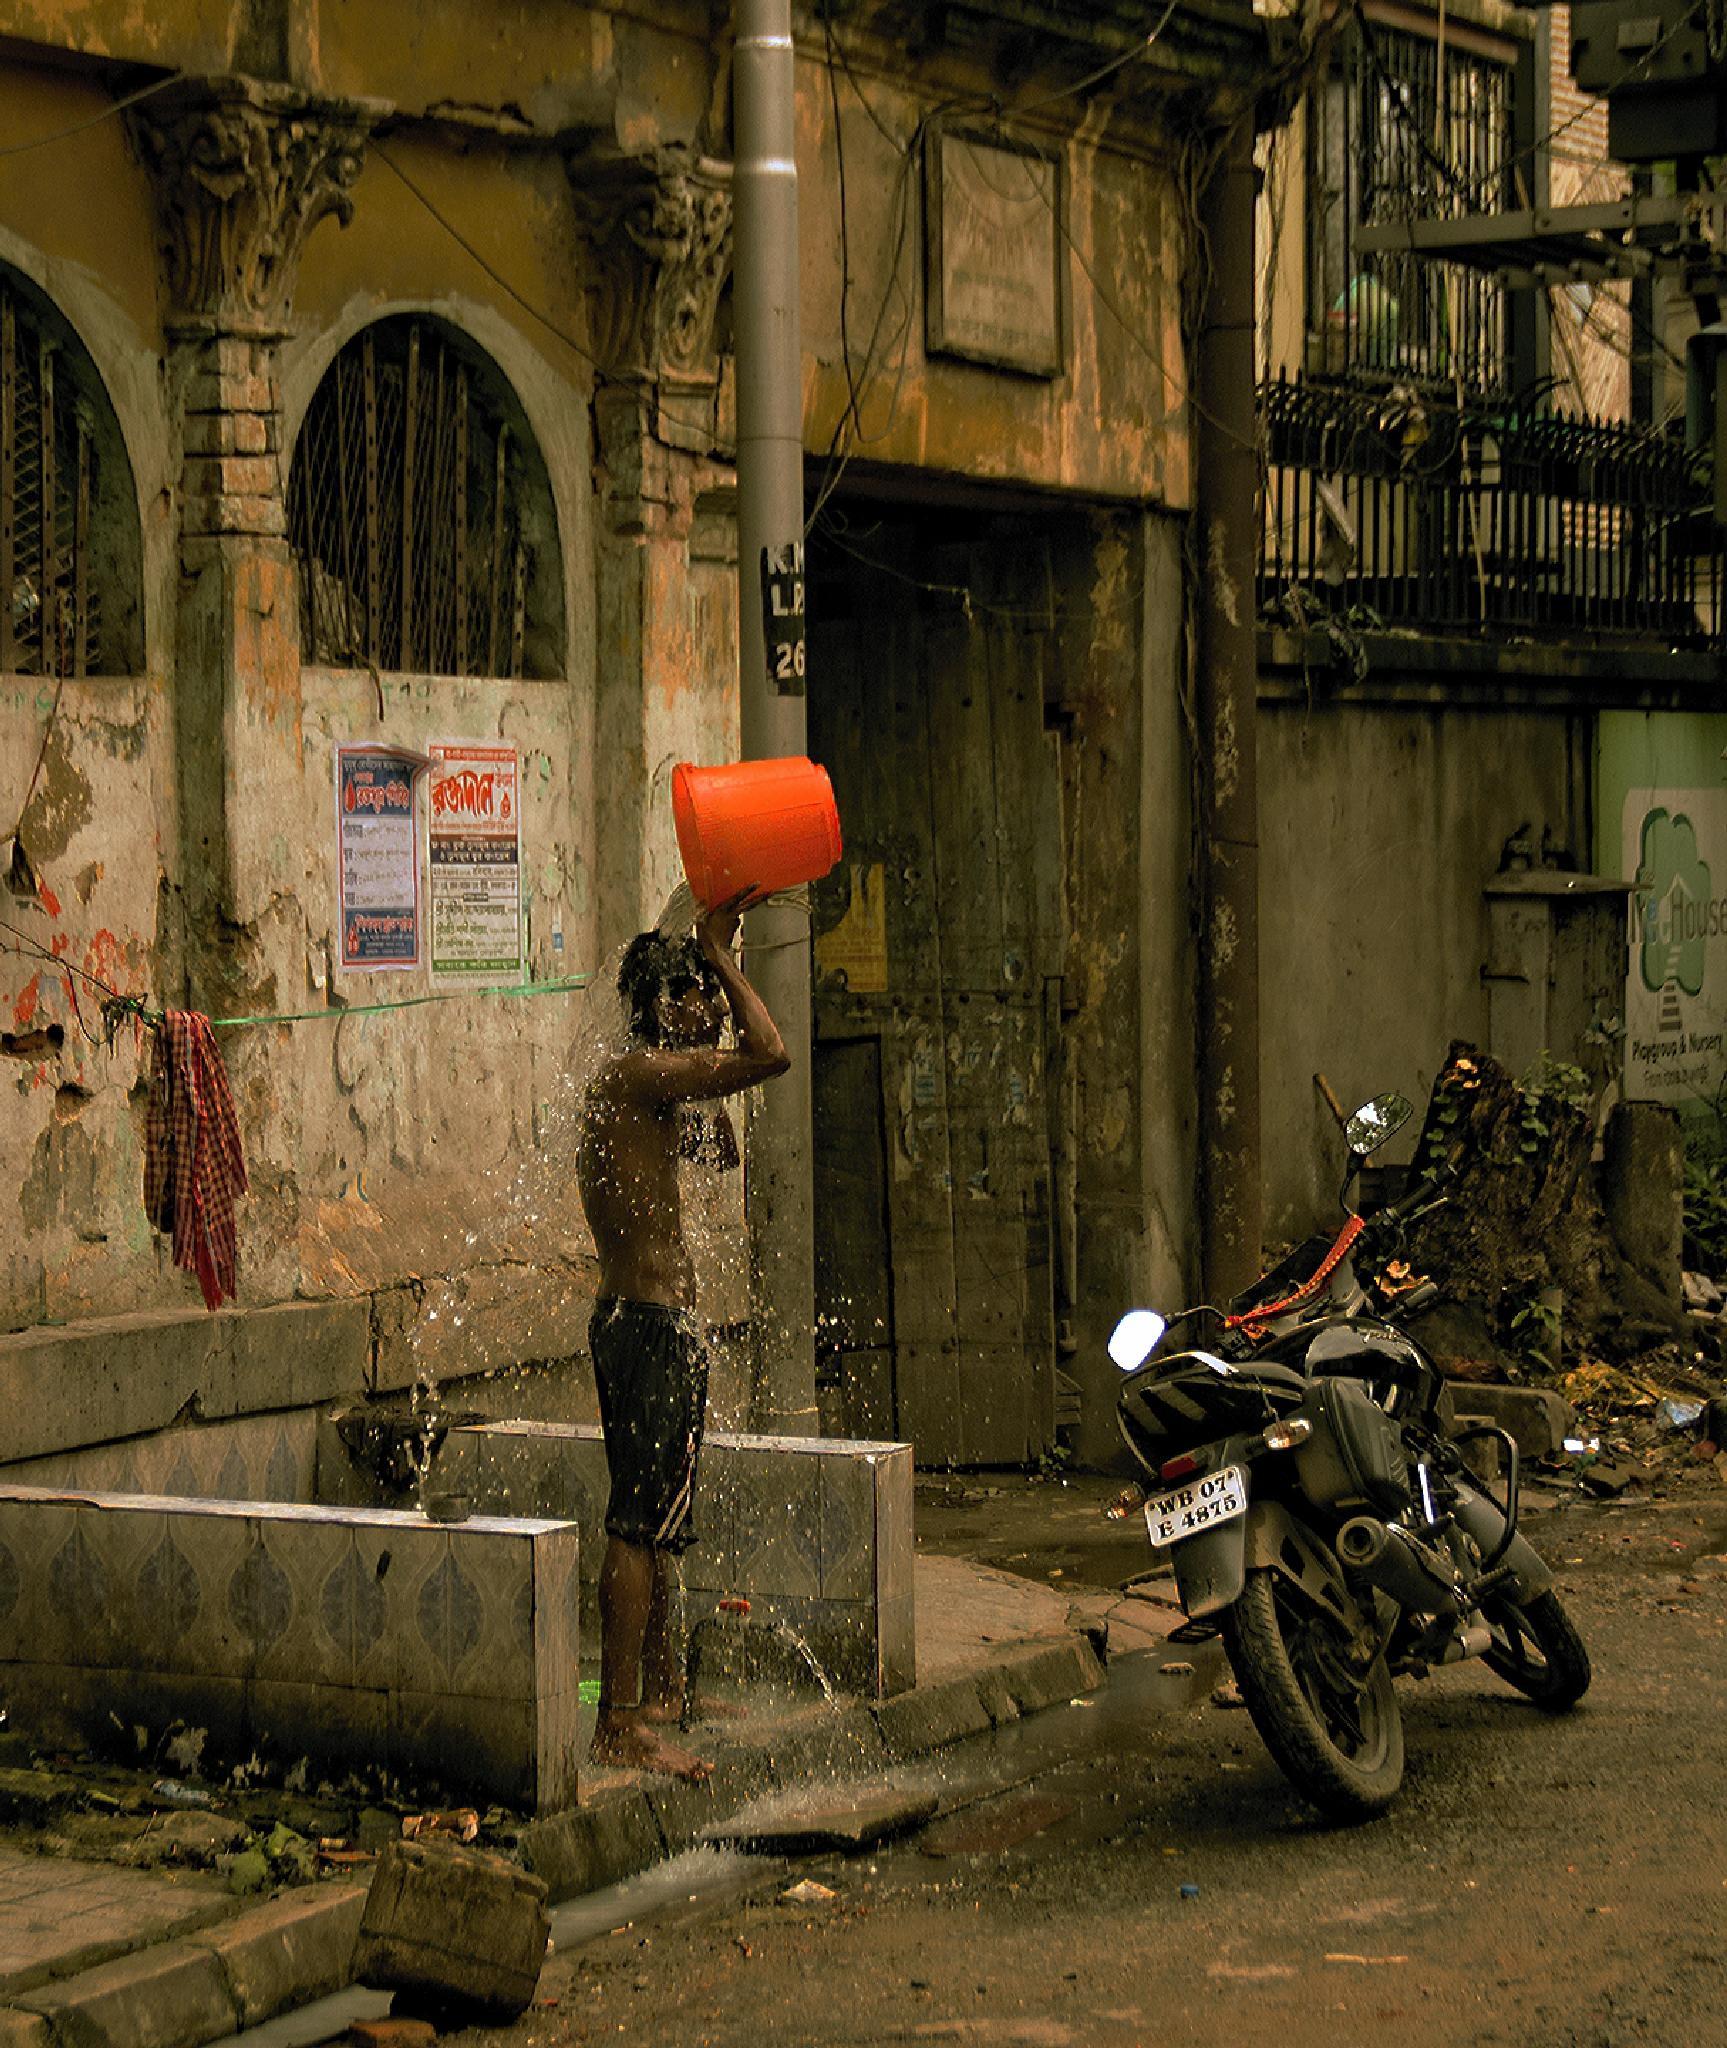 Untitled by Sanjoy Mitra